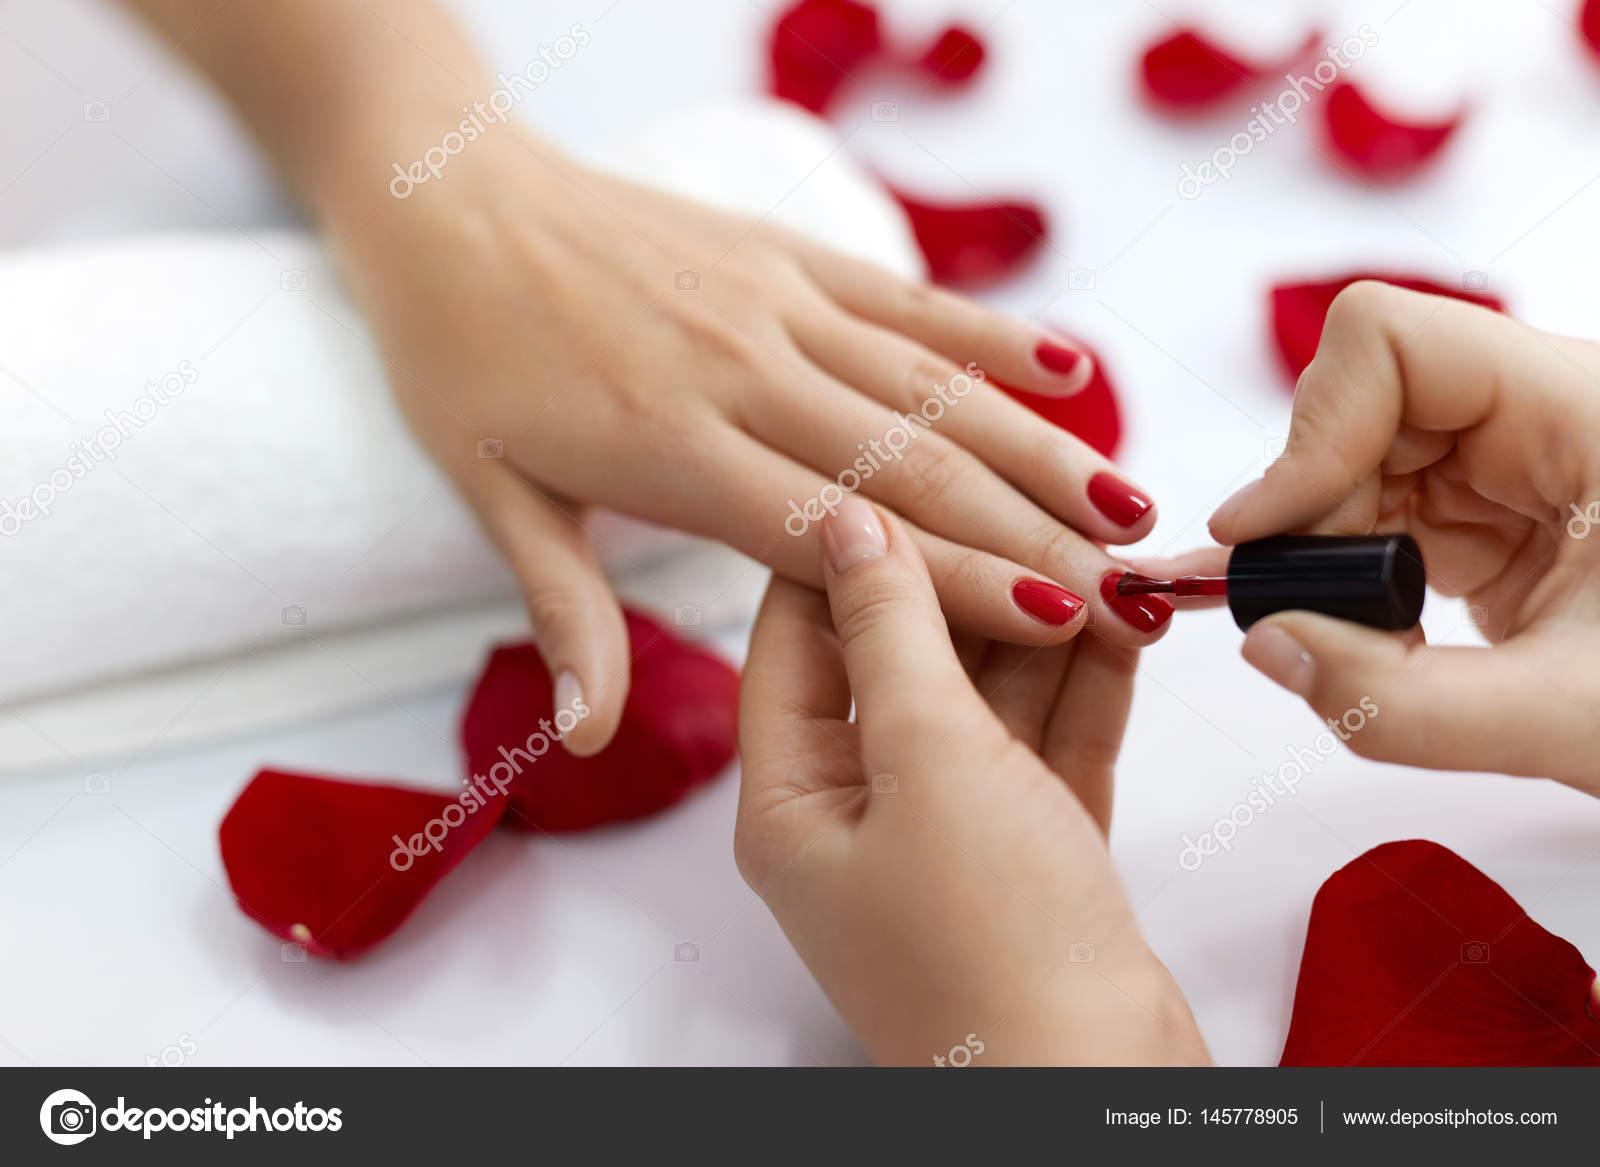 Woman Hands Polishing Nails With Red Nail Polish Stock Photo